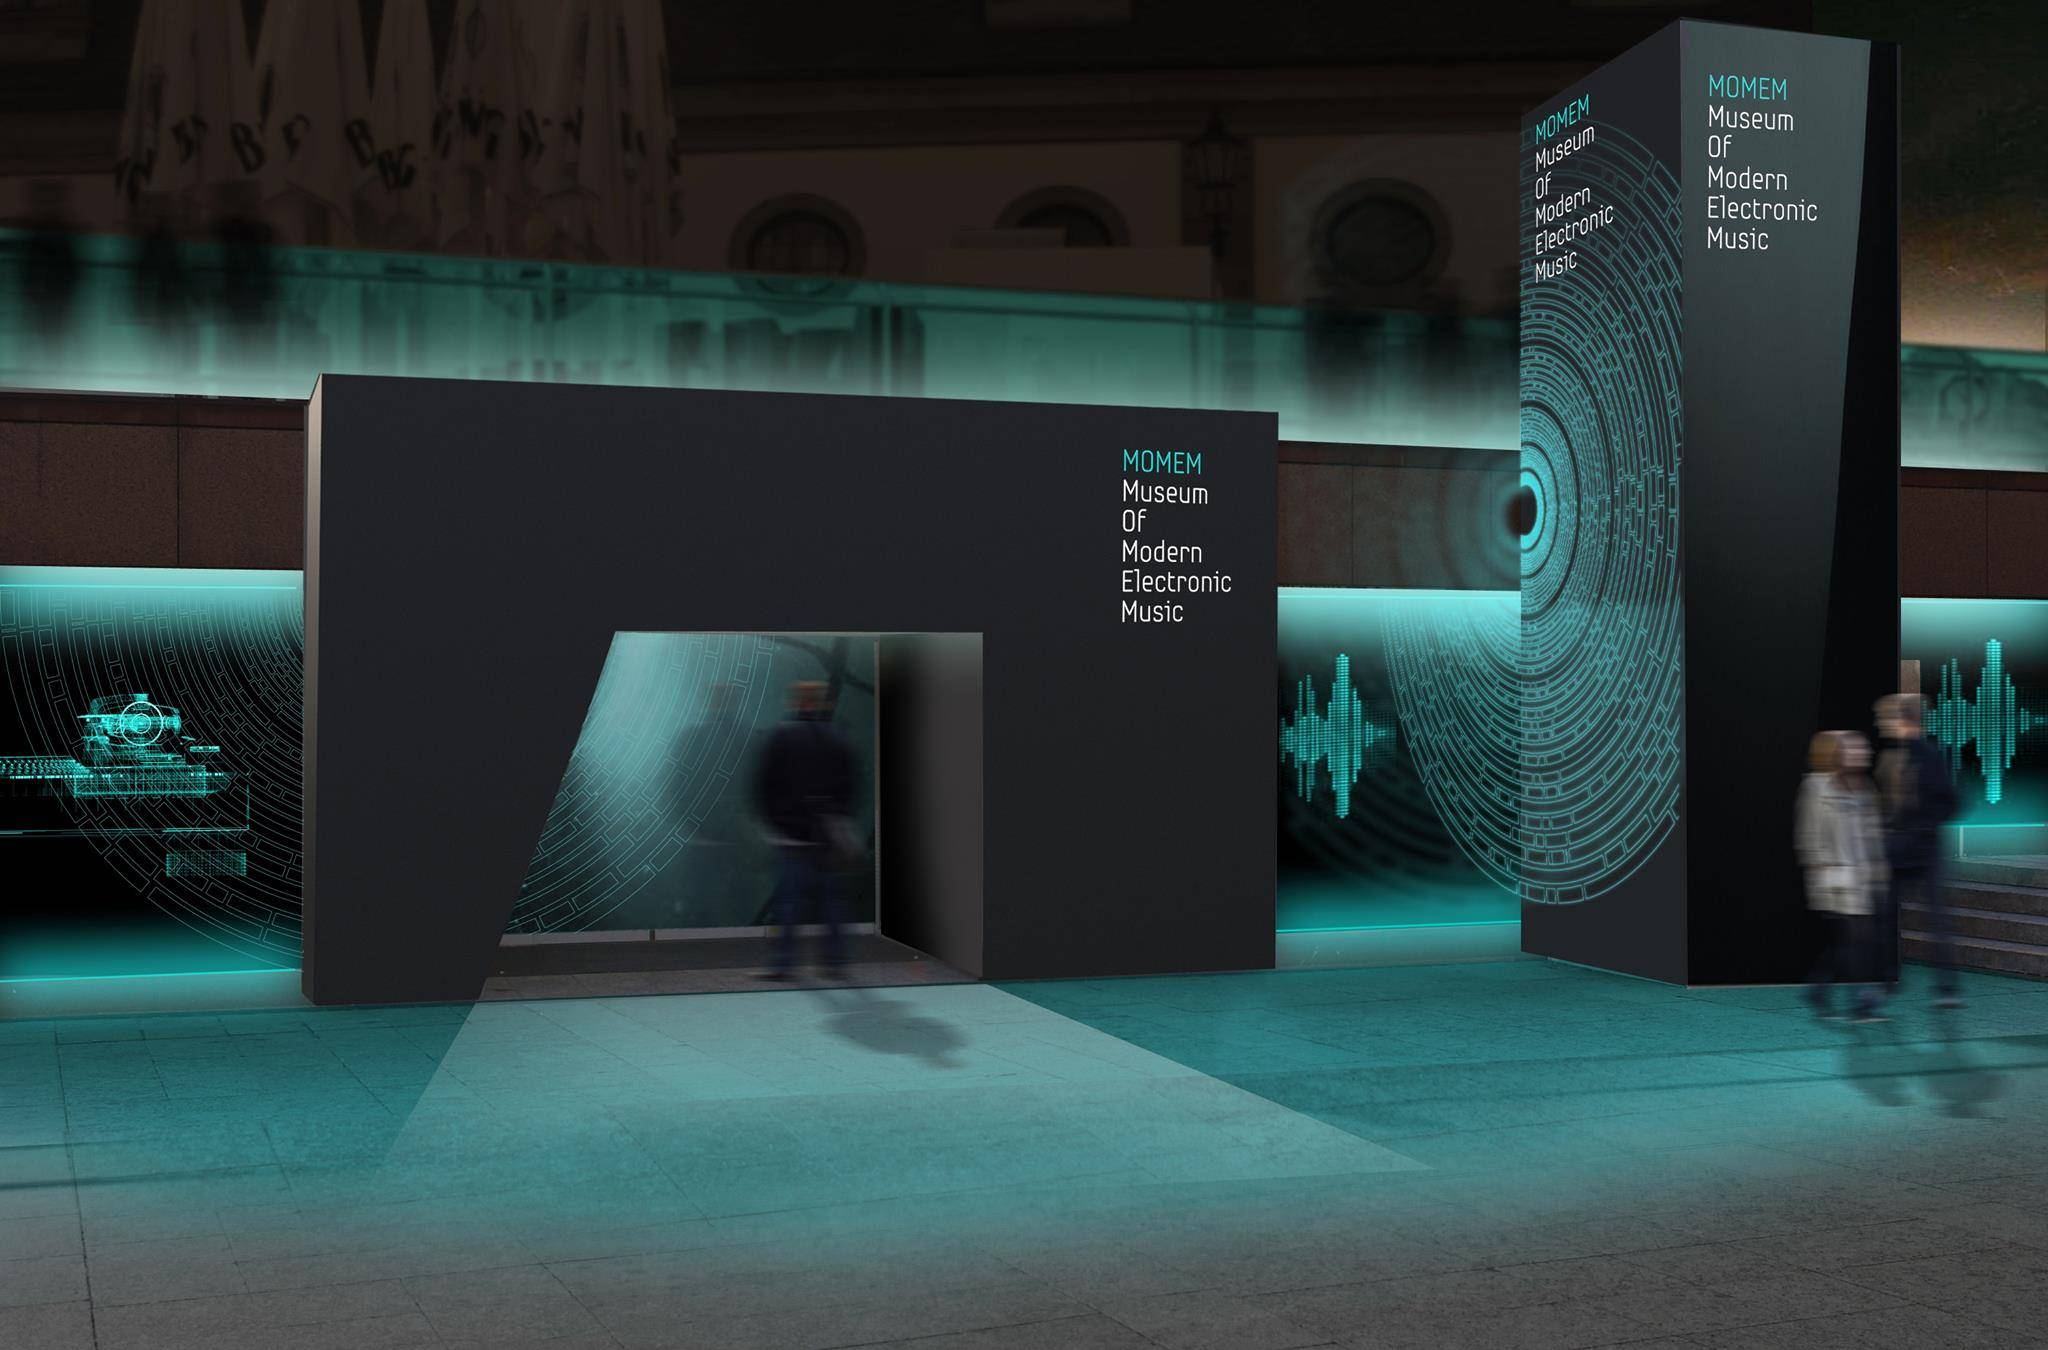 MOMEM (Museum of Modern Electronic Music) will open soon in Frankfurt